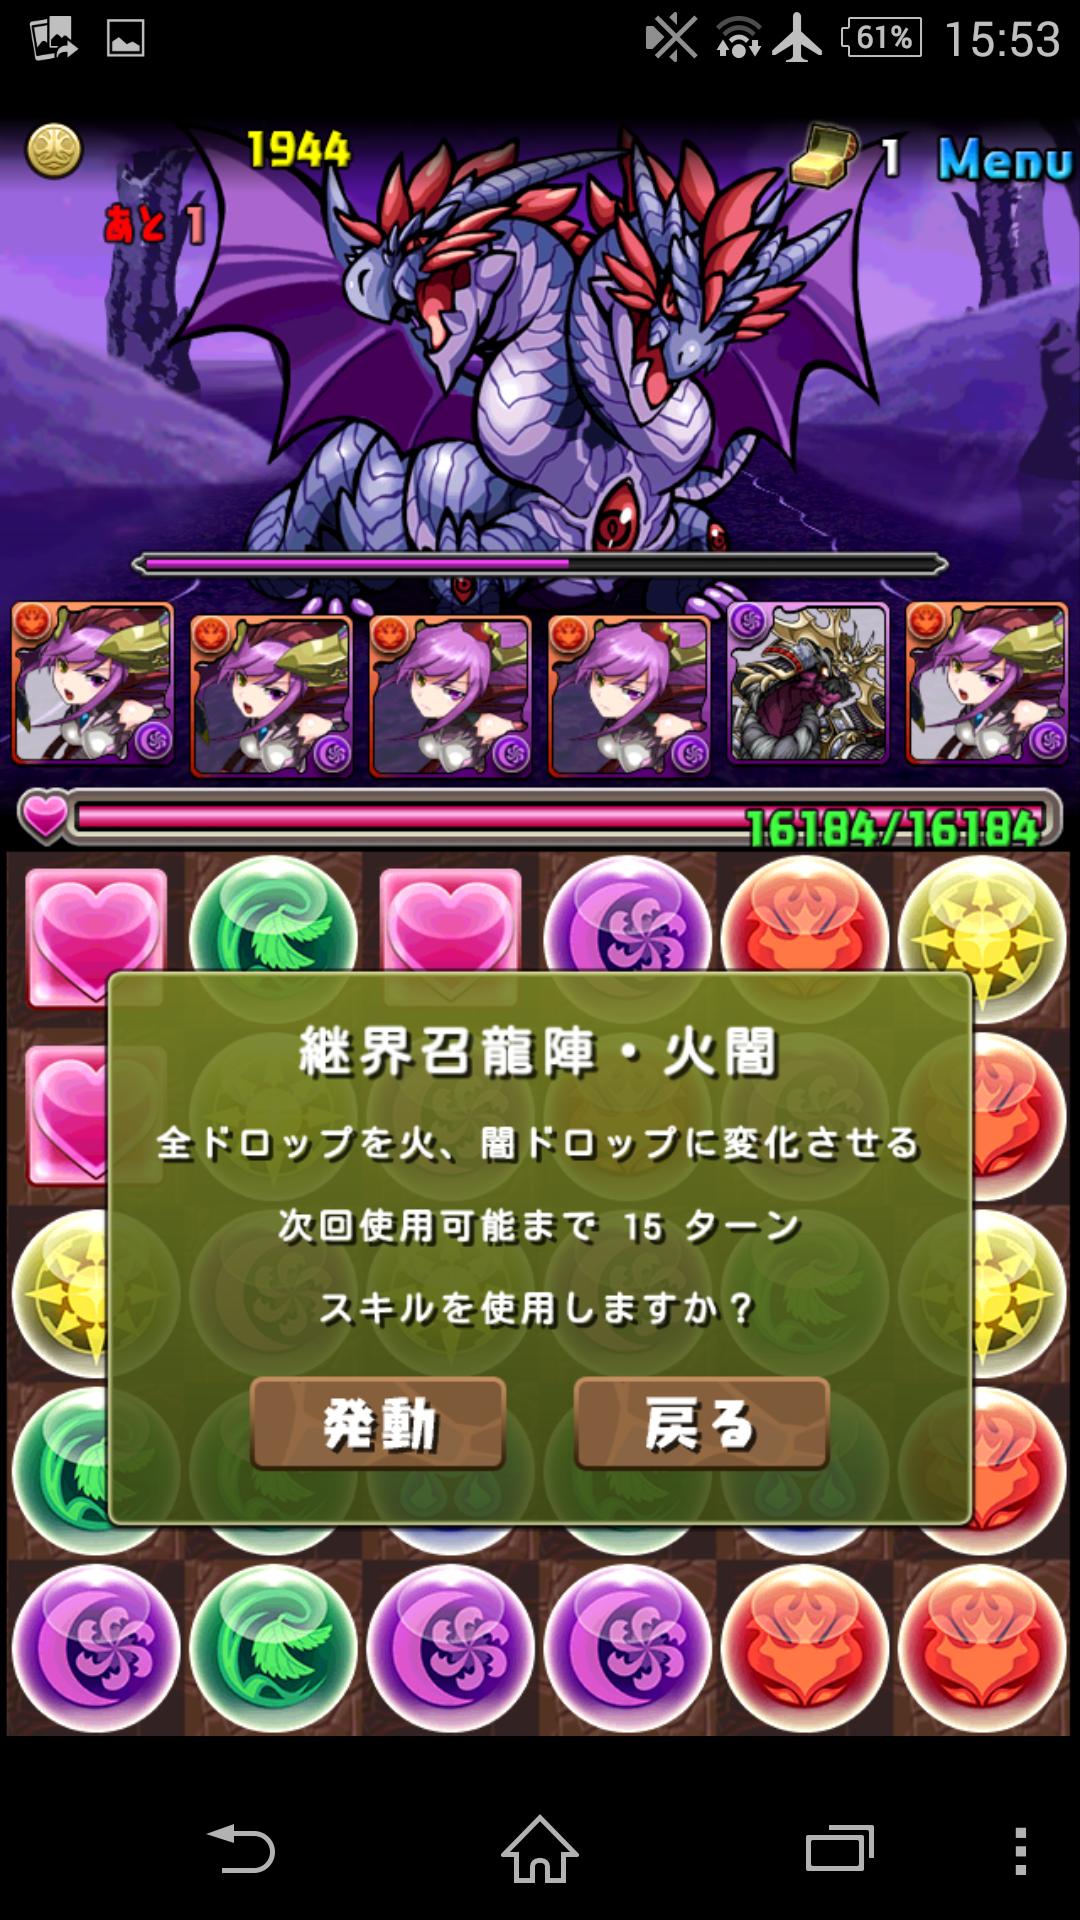 Screenshot_2014-08-20-15-53-34.png